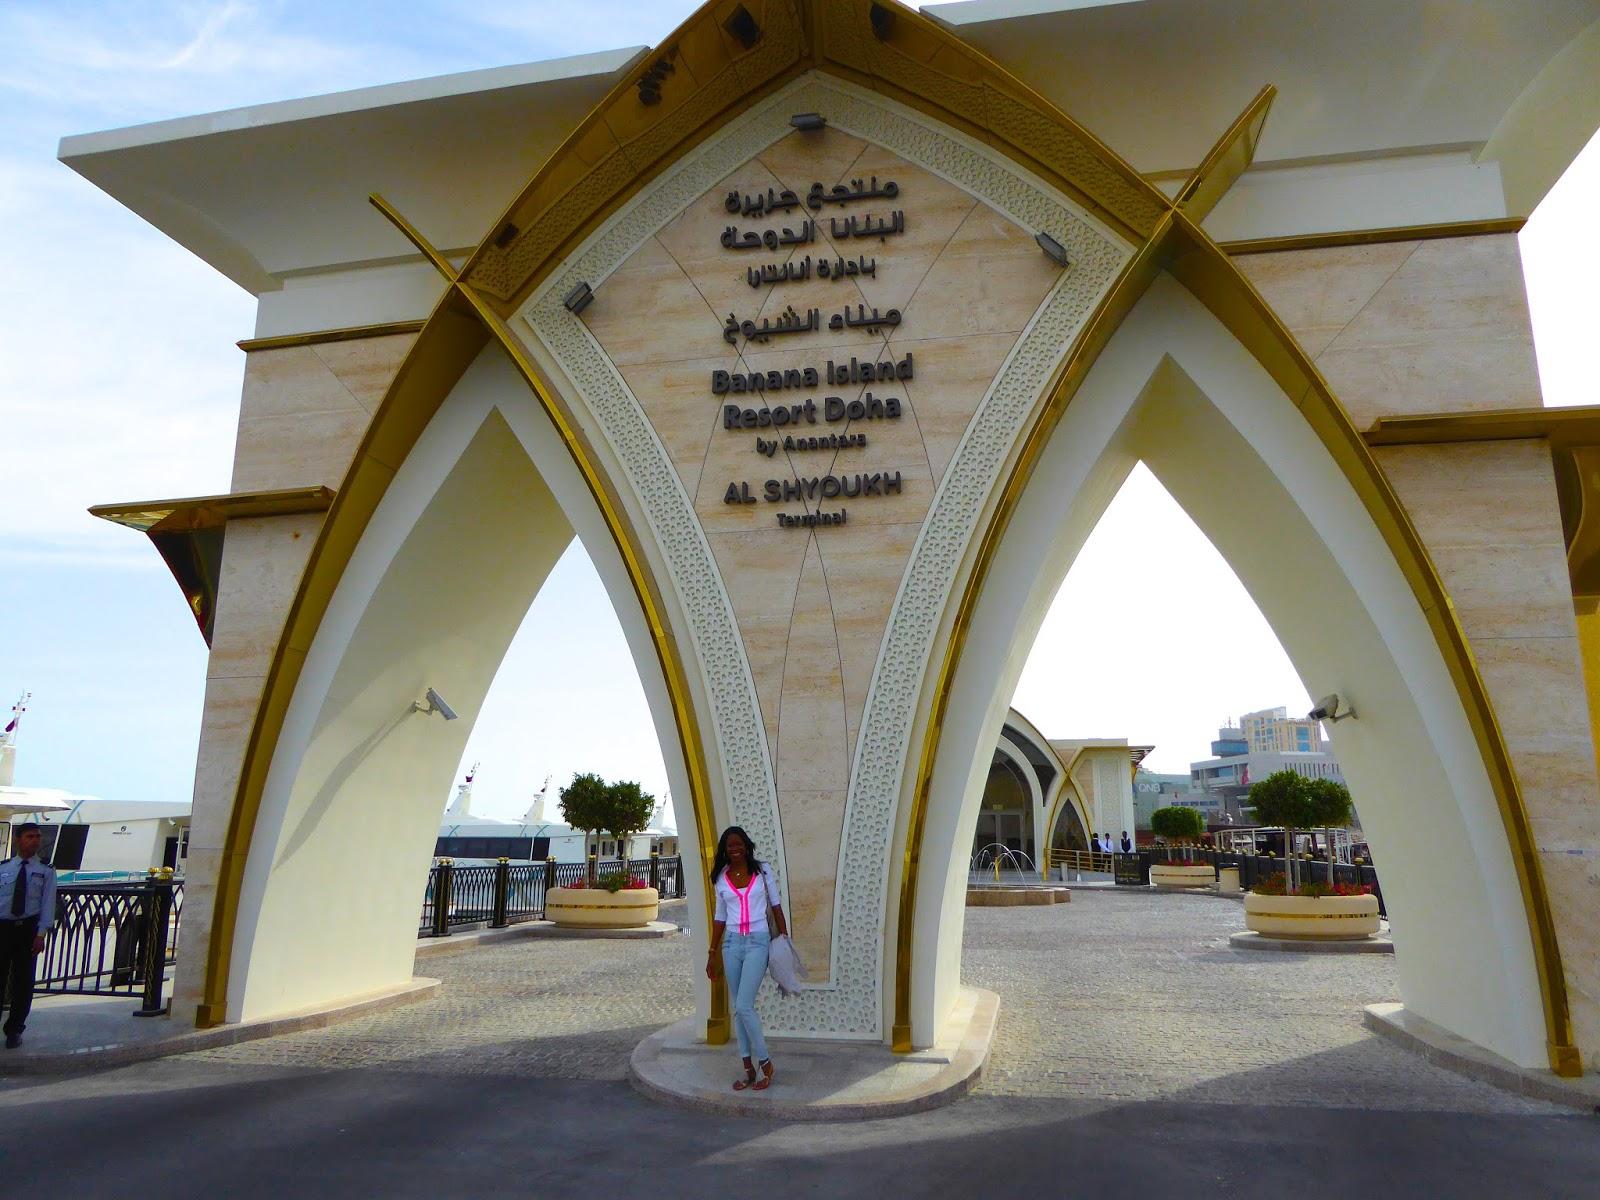 The Blonde Banana Island A Very Special Birthday Trip